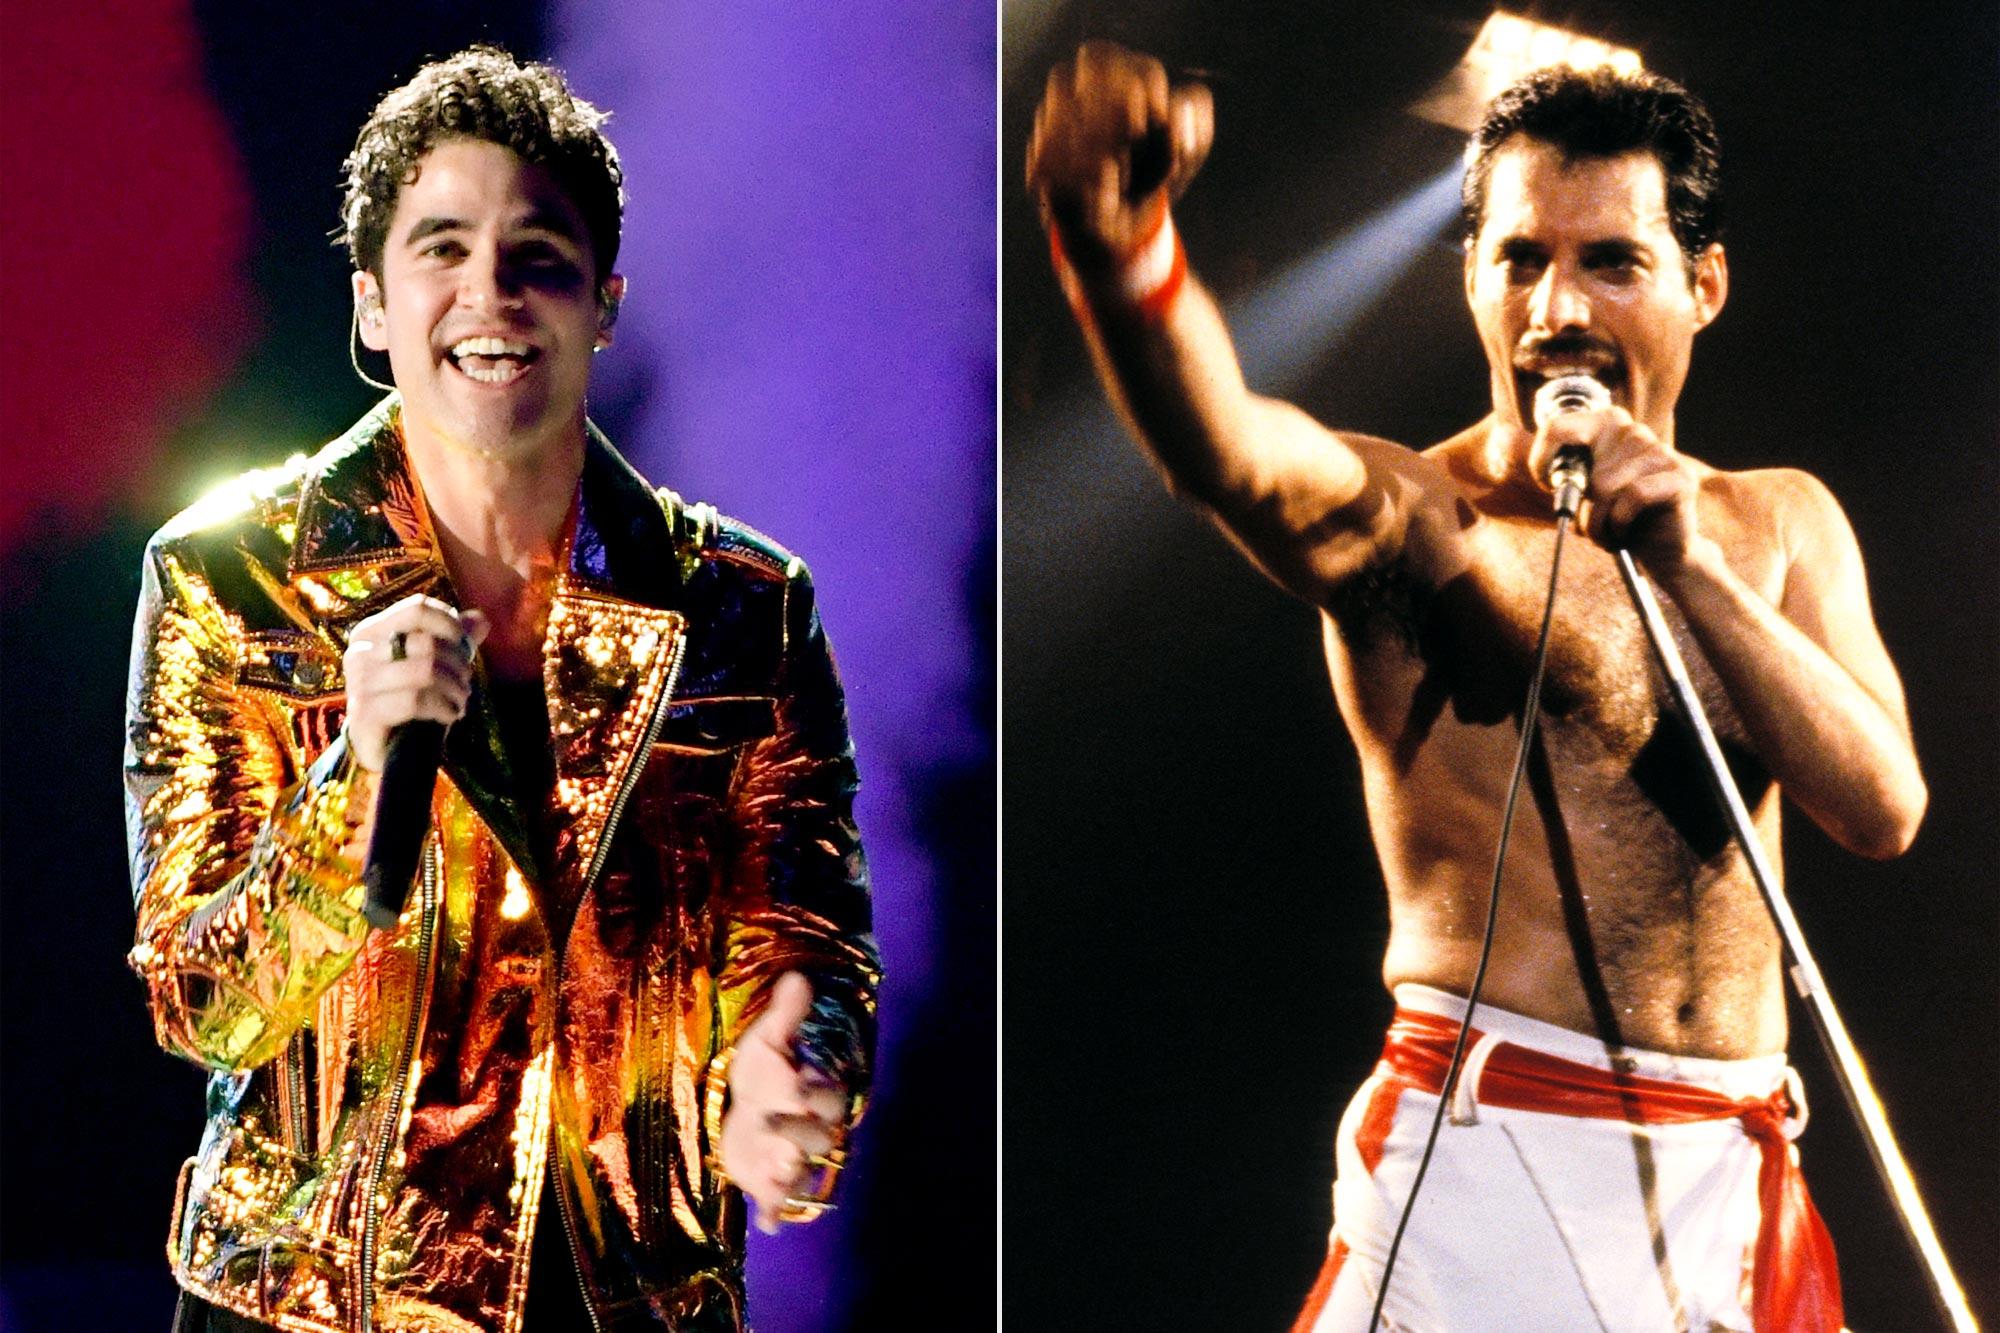 Darren Criss; Freddie Mercury